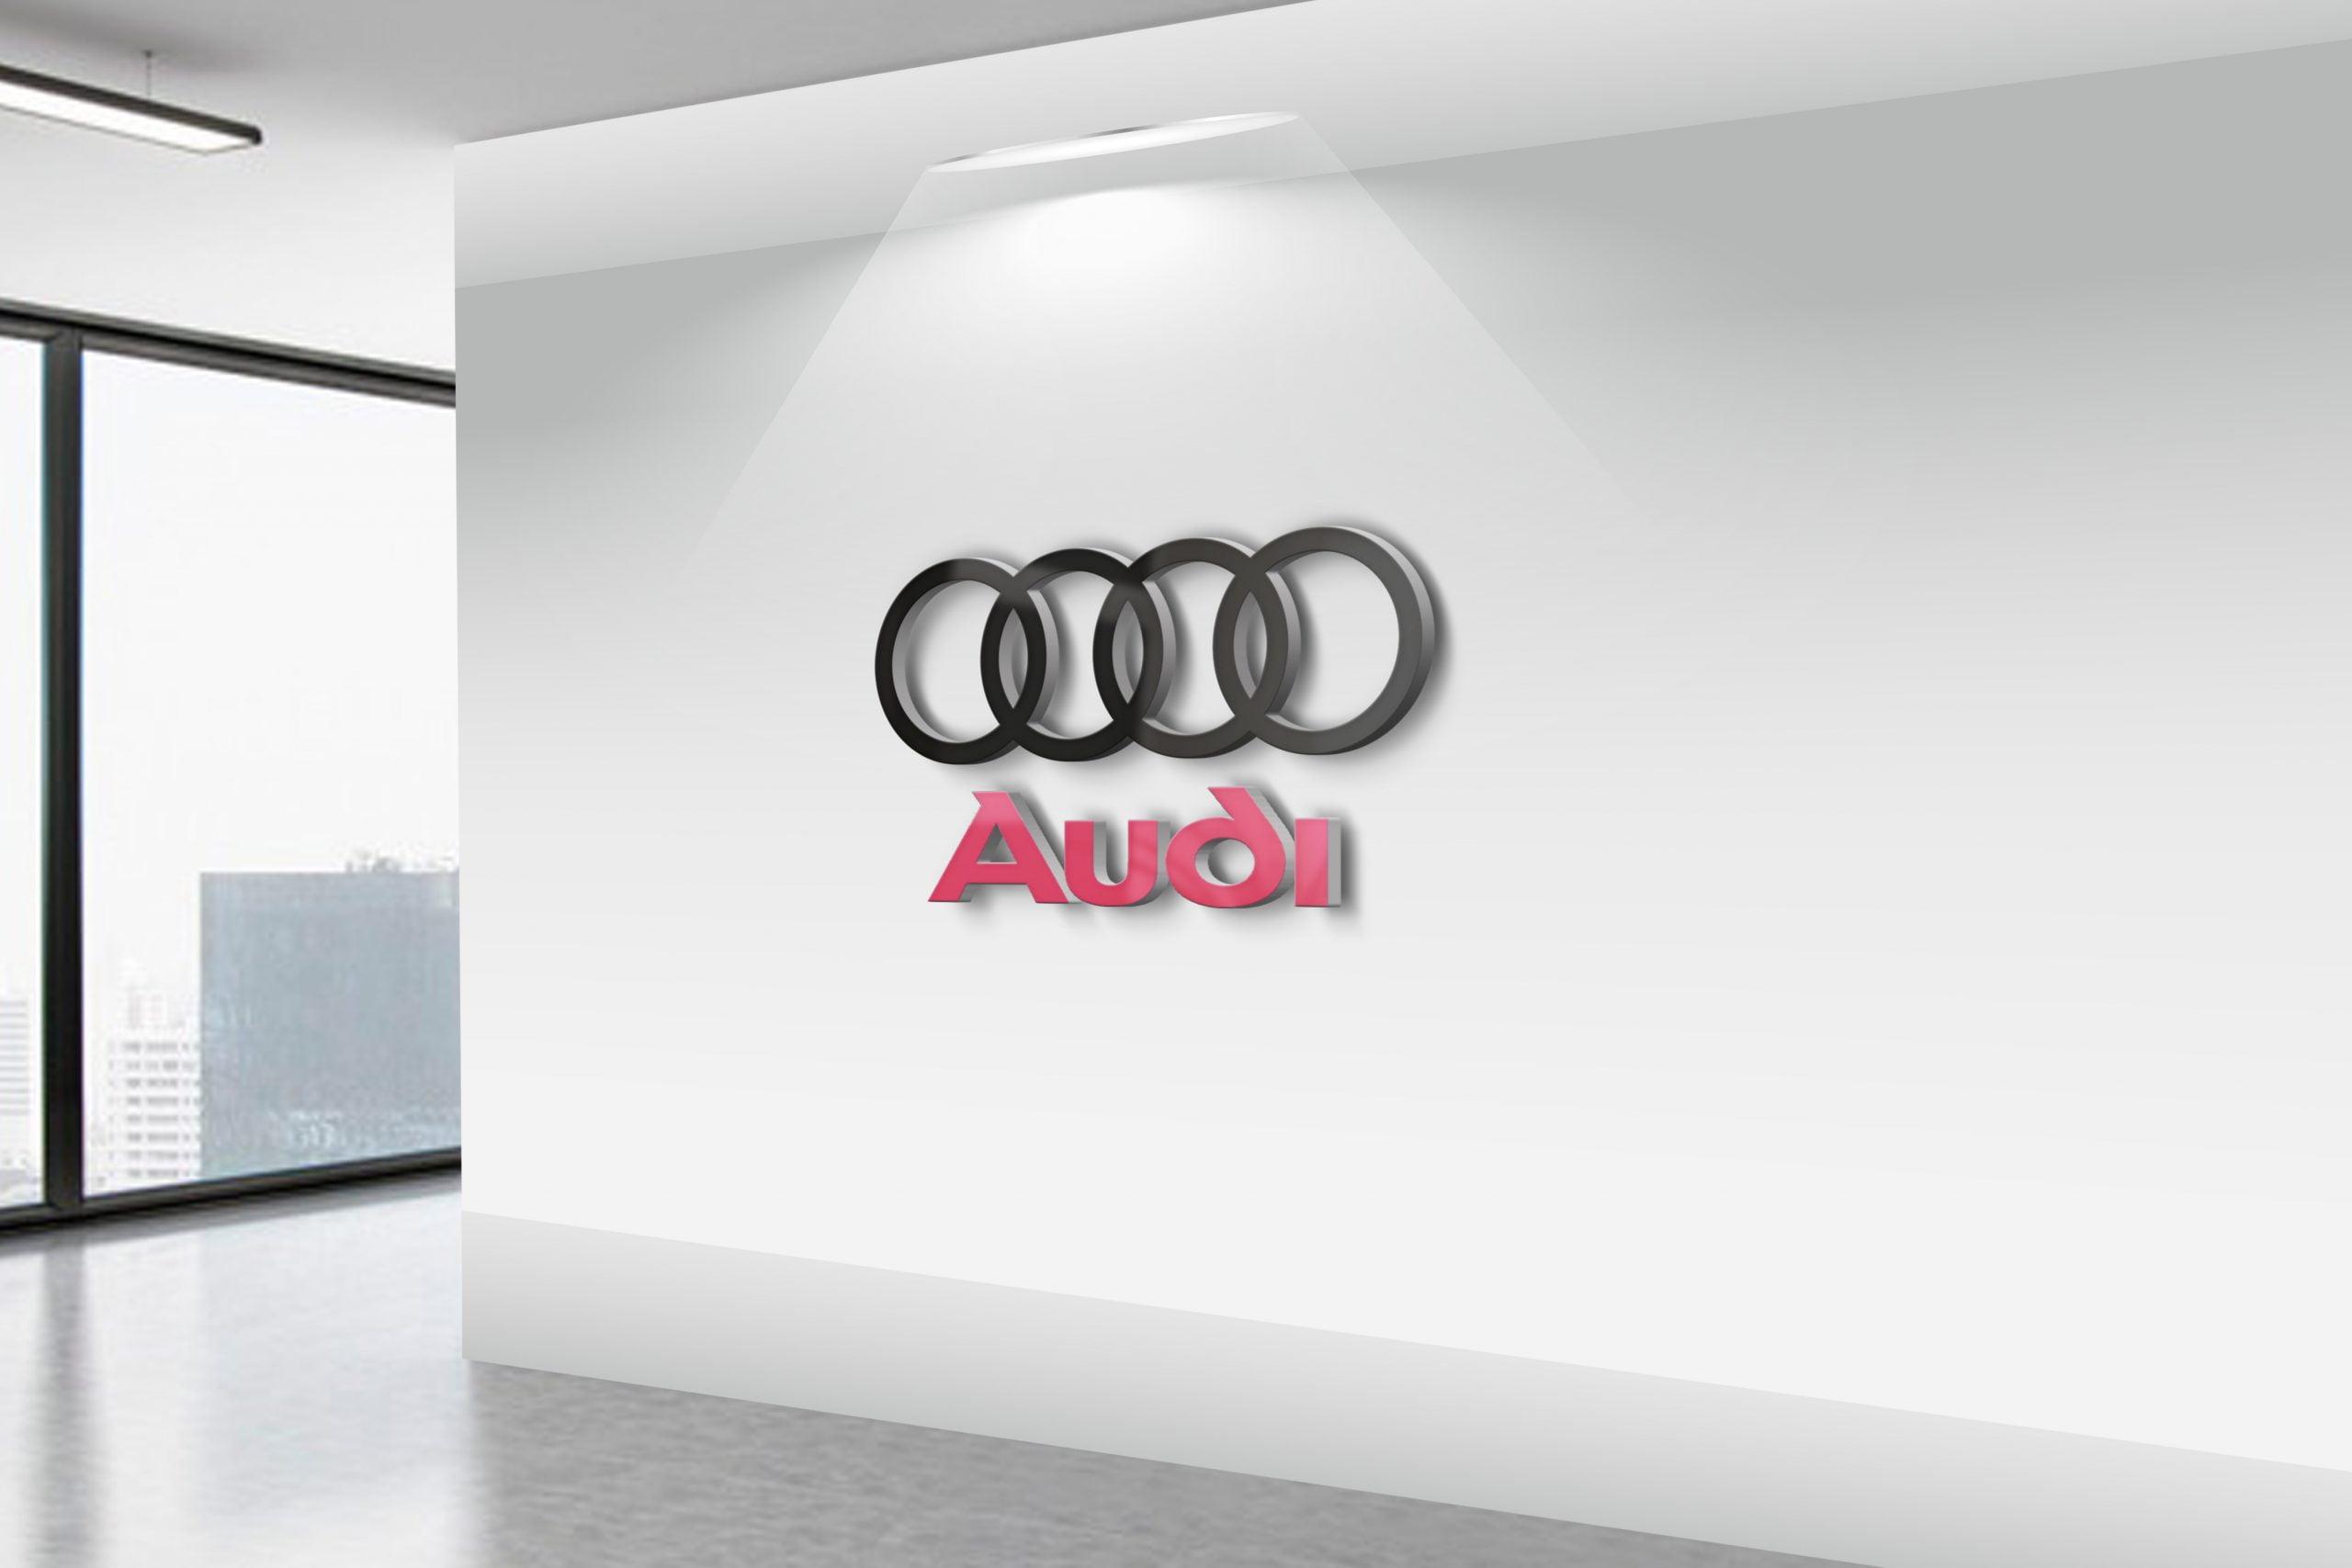 Audi-Realistic-3D-Wall-Logo-MockUp